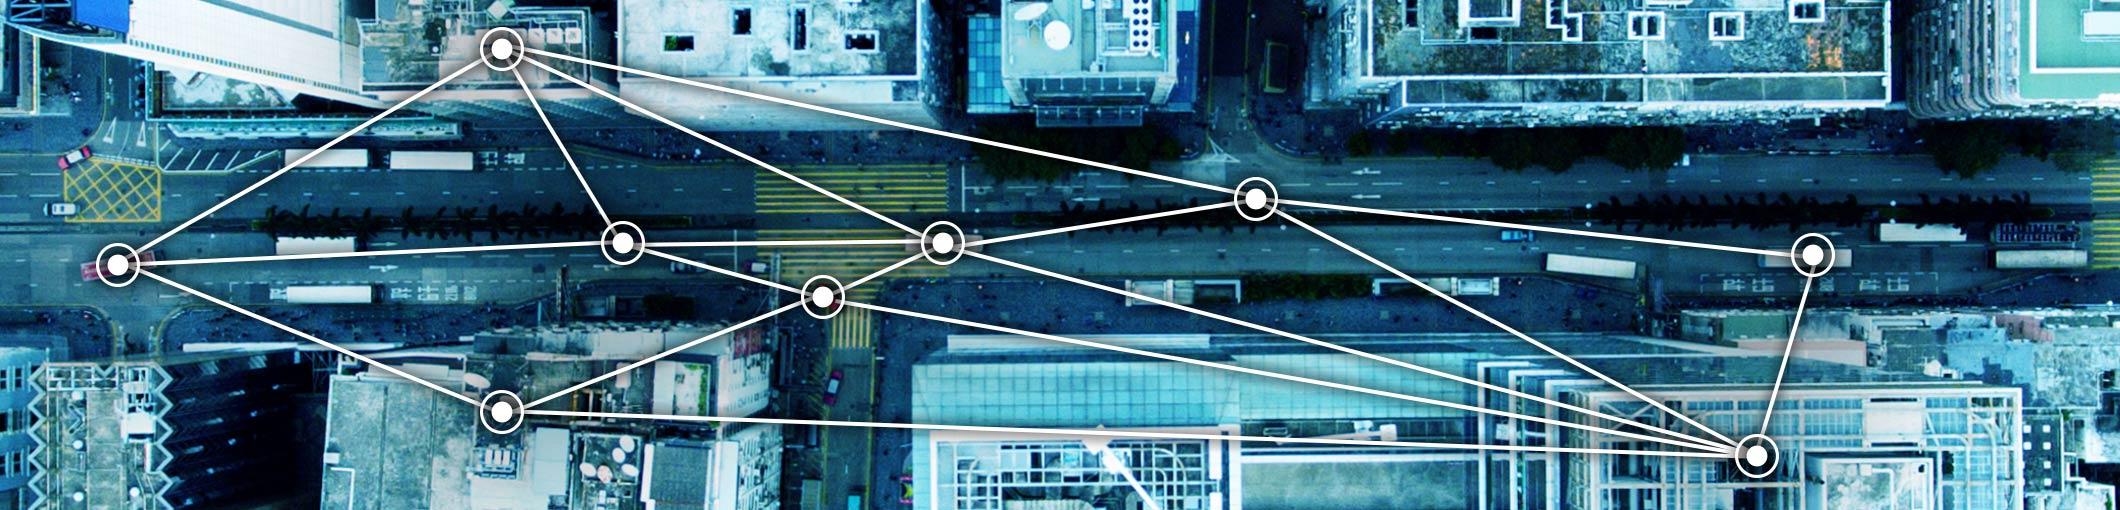 Connected Fleet Cybersecurity